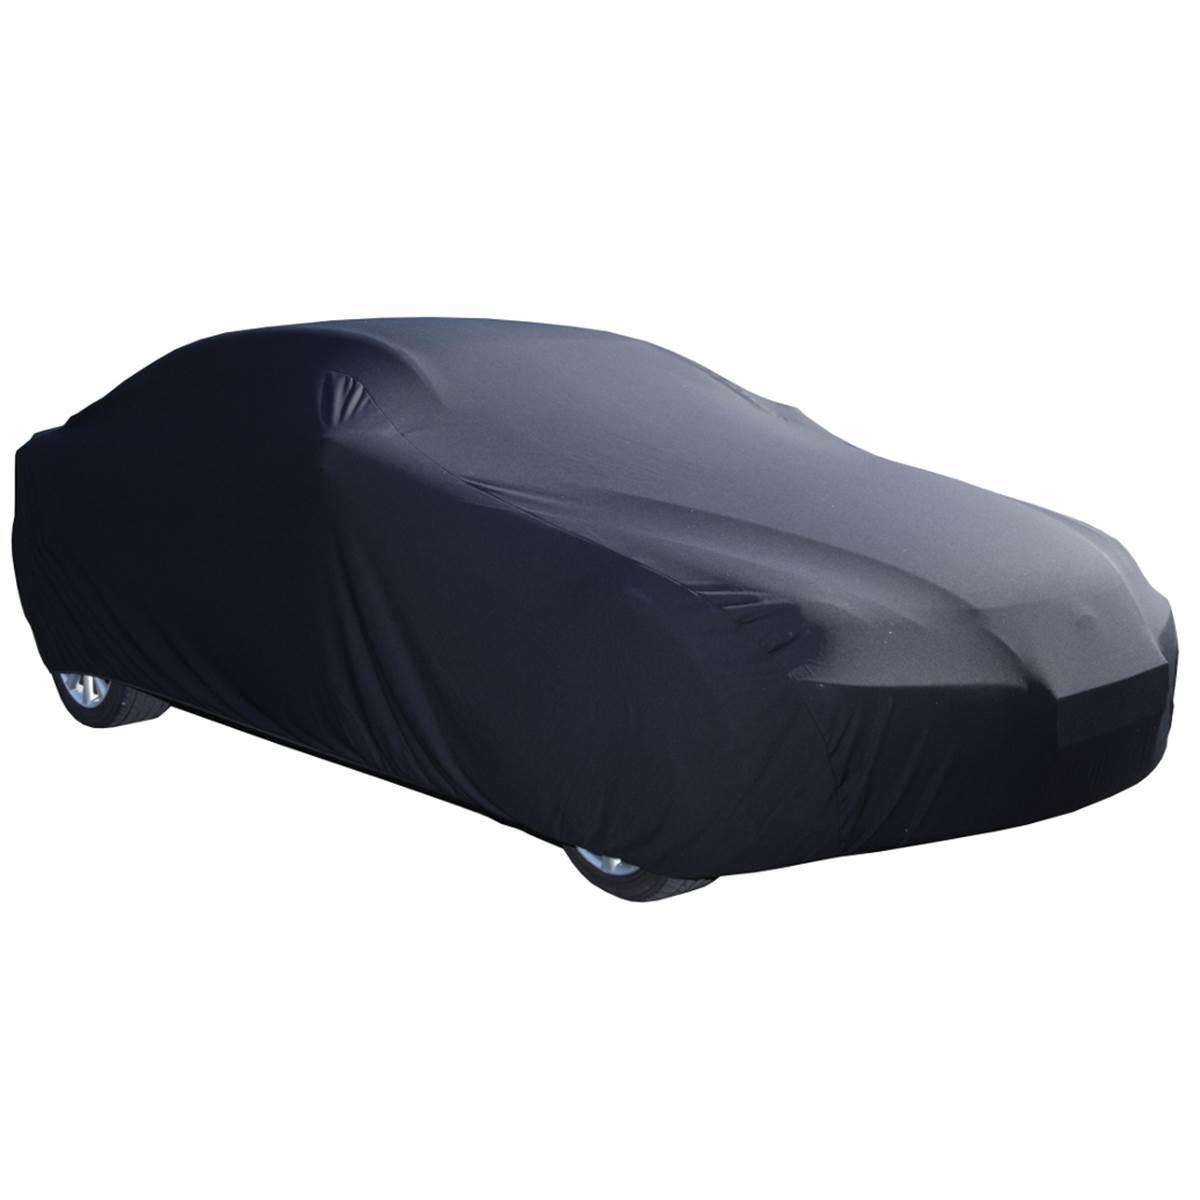 bache de protection voiture feu vert. Black Bedroom Furniture Sets. Home Design Ideas